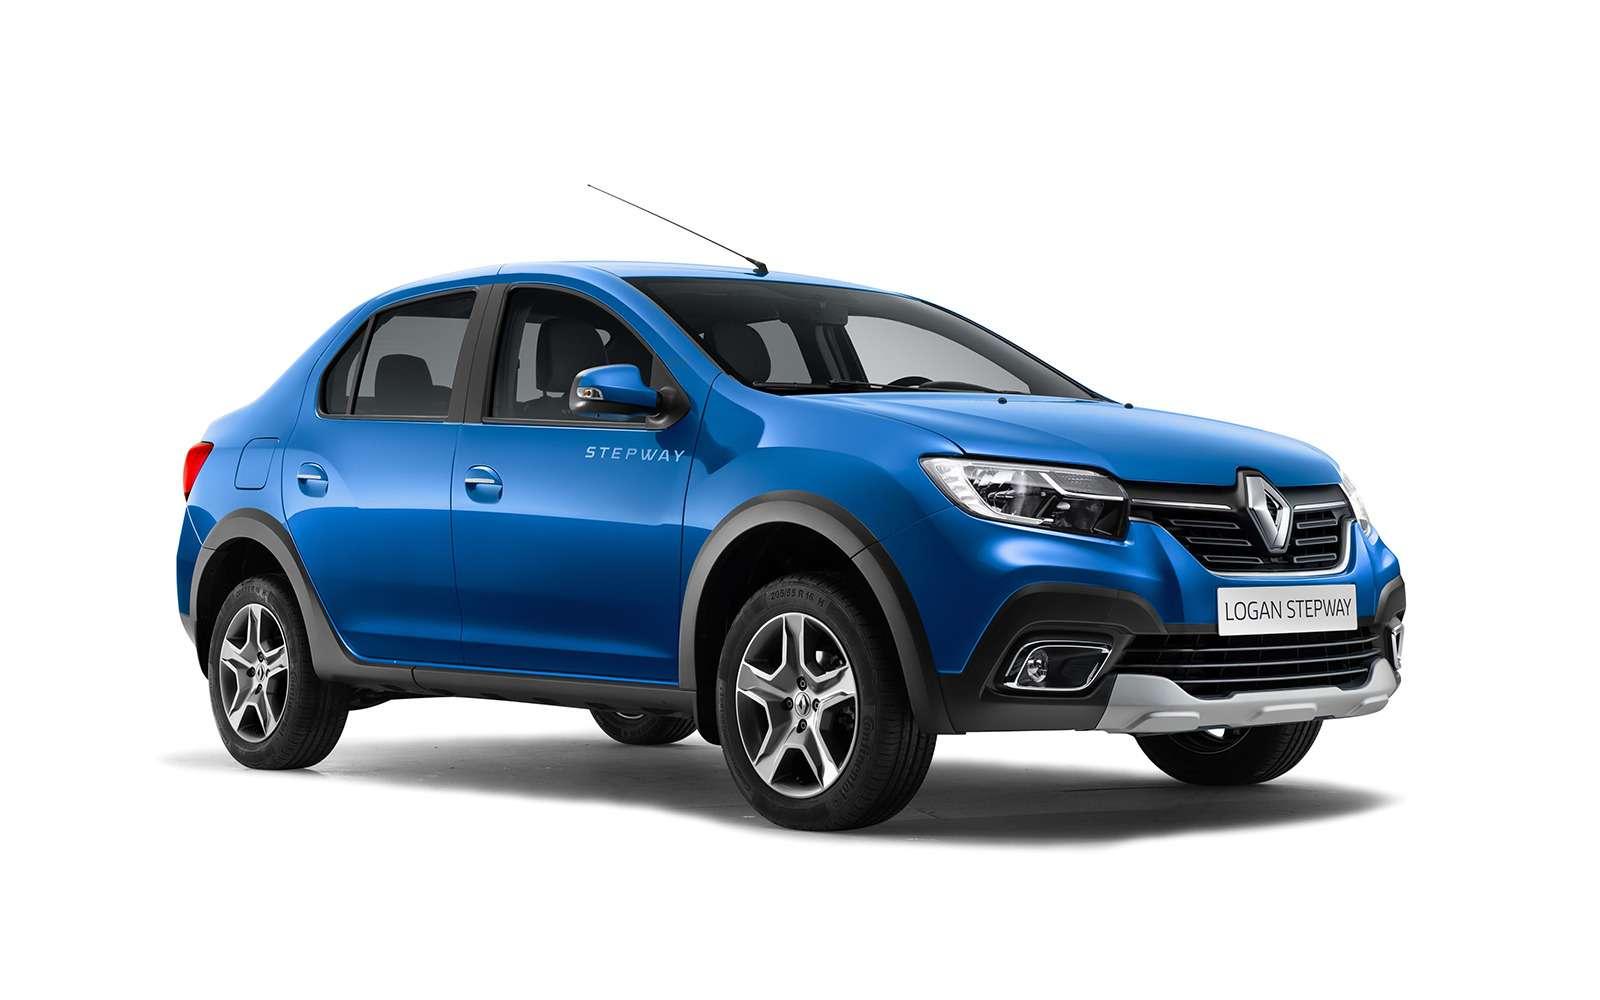 Renault объявила цены наLogan Stepway иSandero Stepway— фото 913030